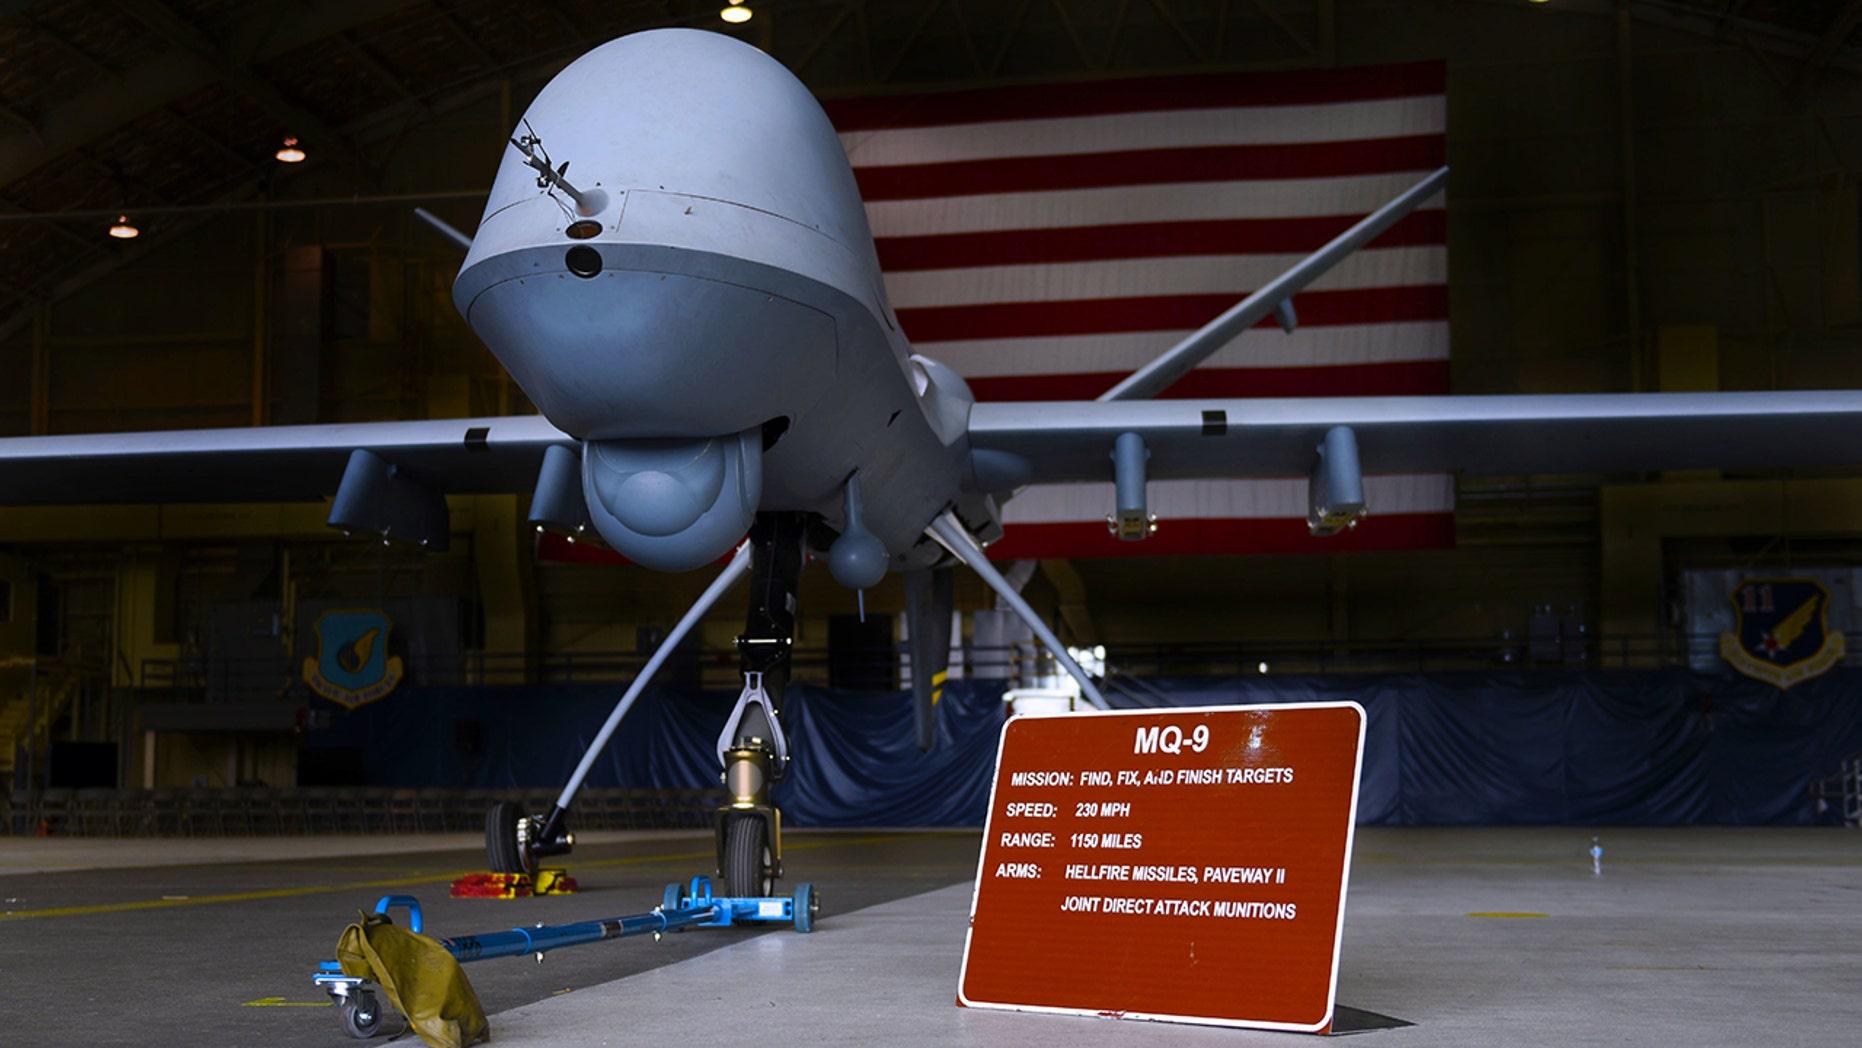 The MQ-9 Reaper drone waits in a hangar at Joint Base Elmendorf-Richardson, Alaska.